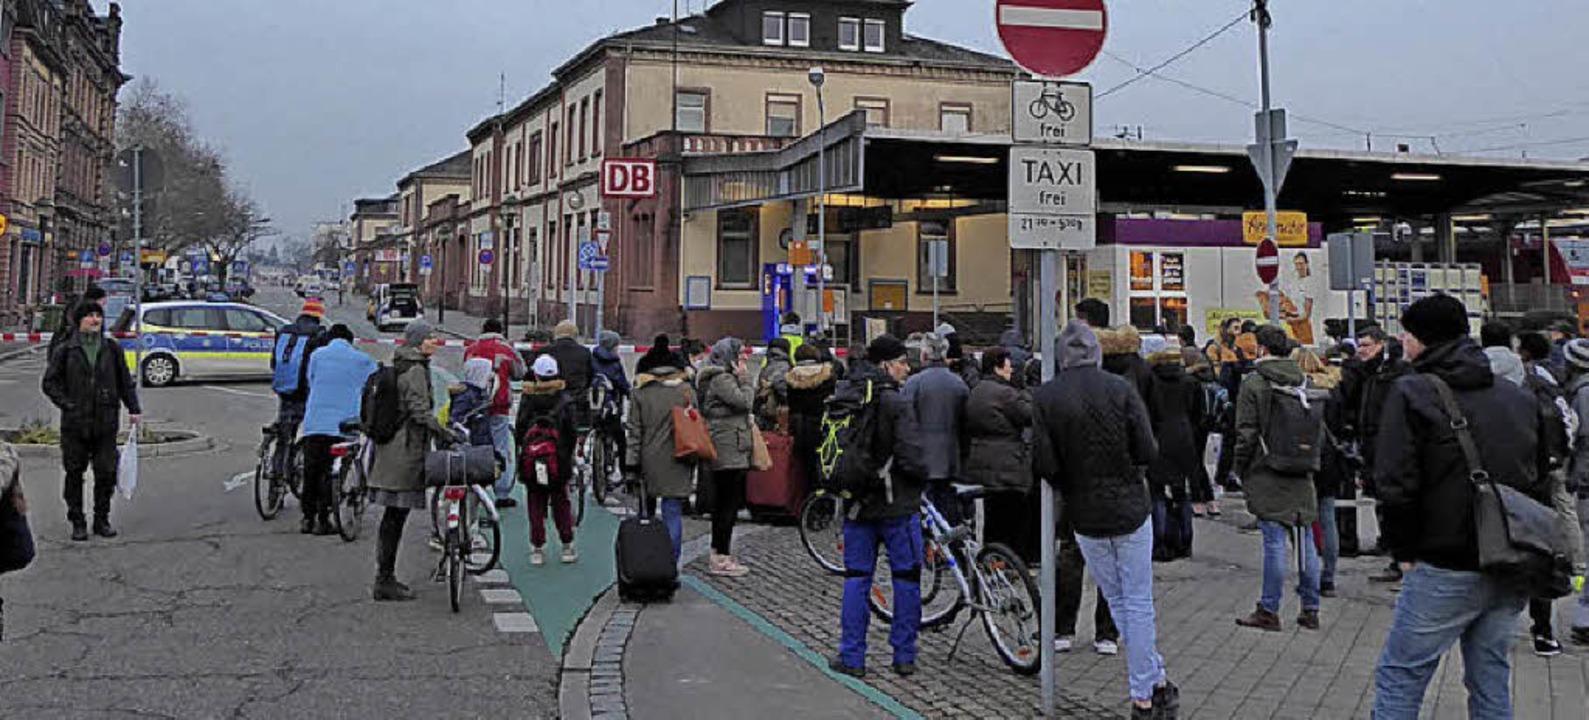 Offenburg Bombendrohung